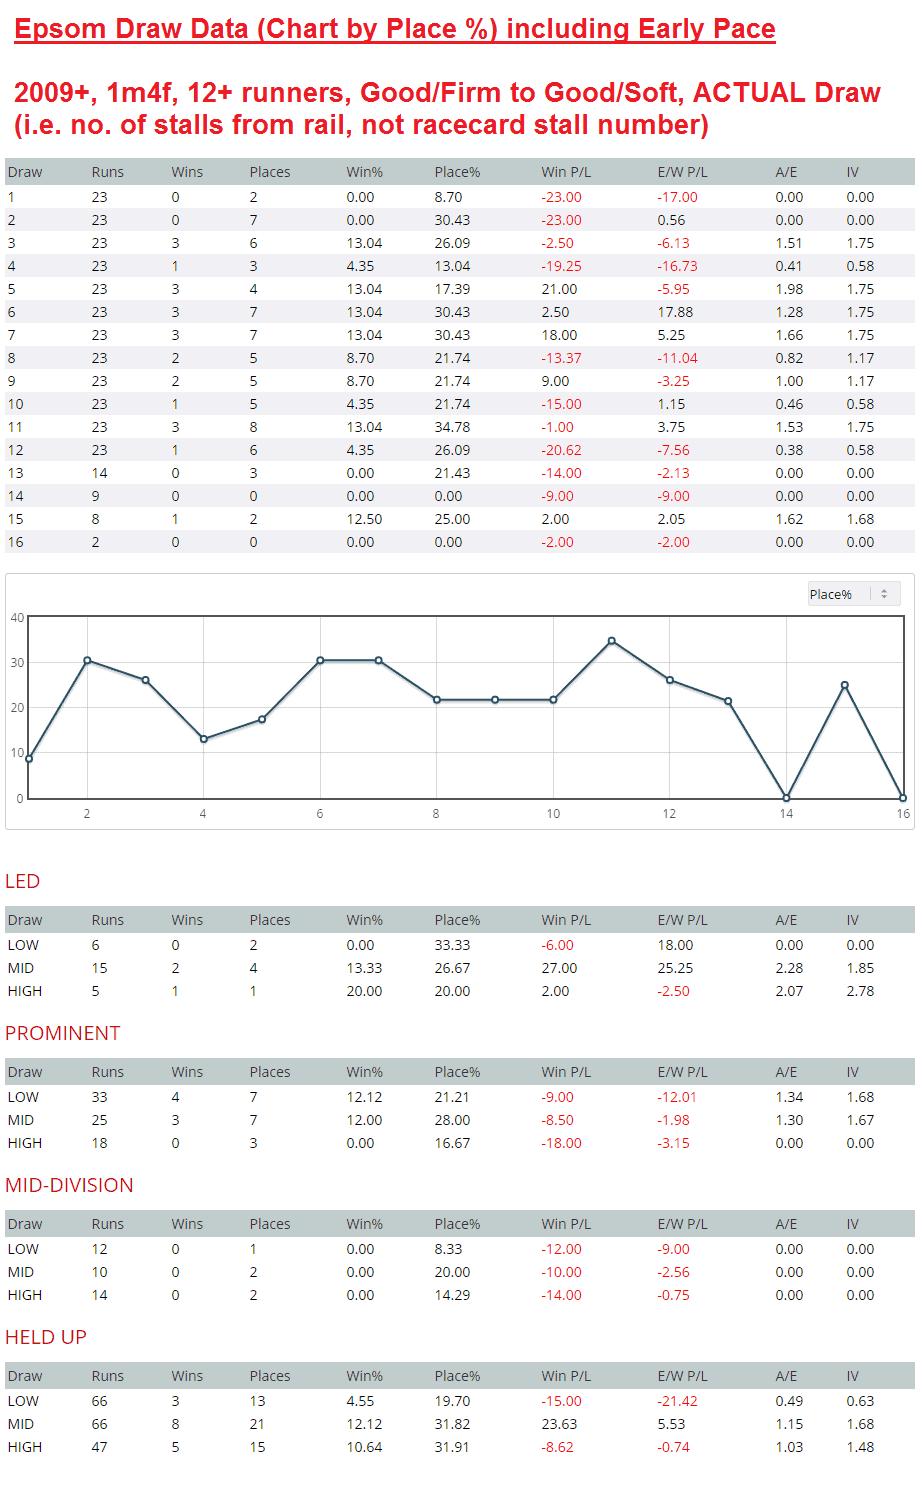 Epsom Derby distance draw data: very little in it...